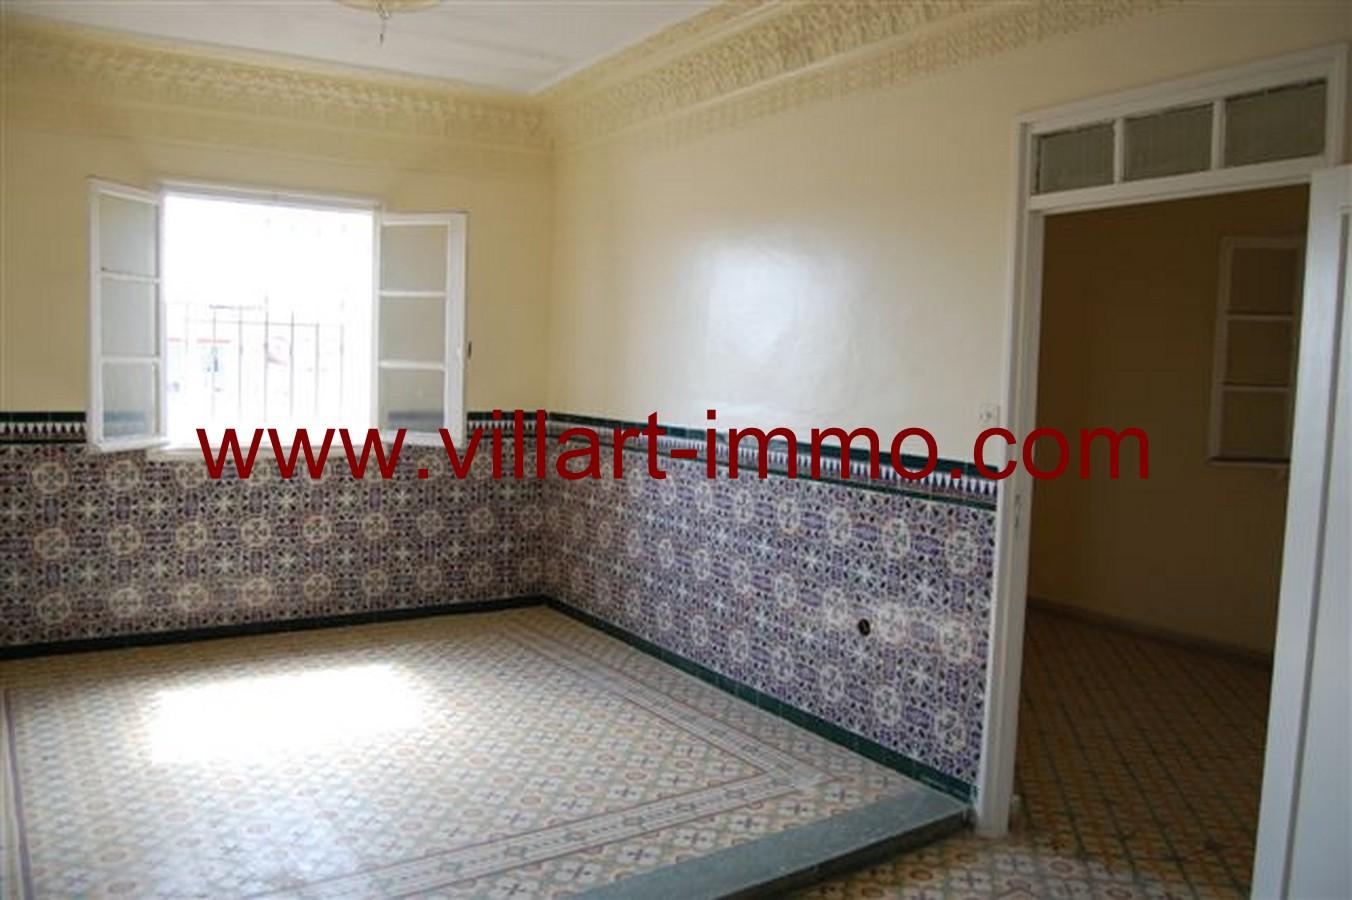 5-Vente-Appartement-Tanger-Salon -VA532-Jirari-Villart Immo